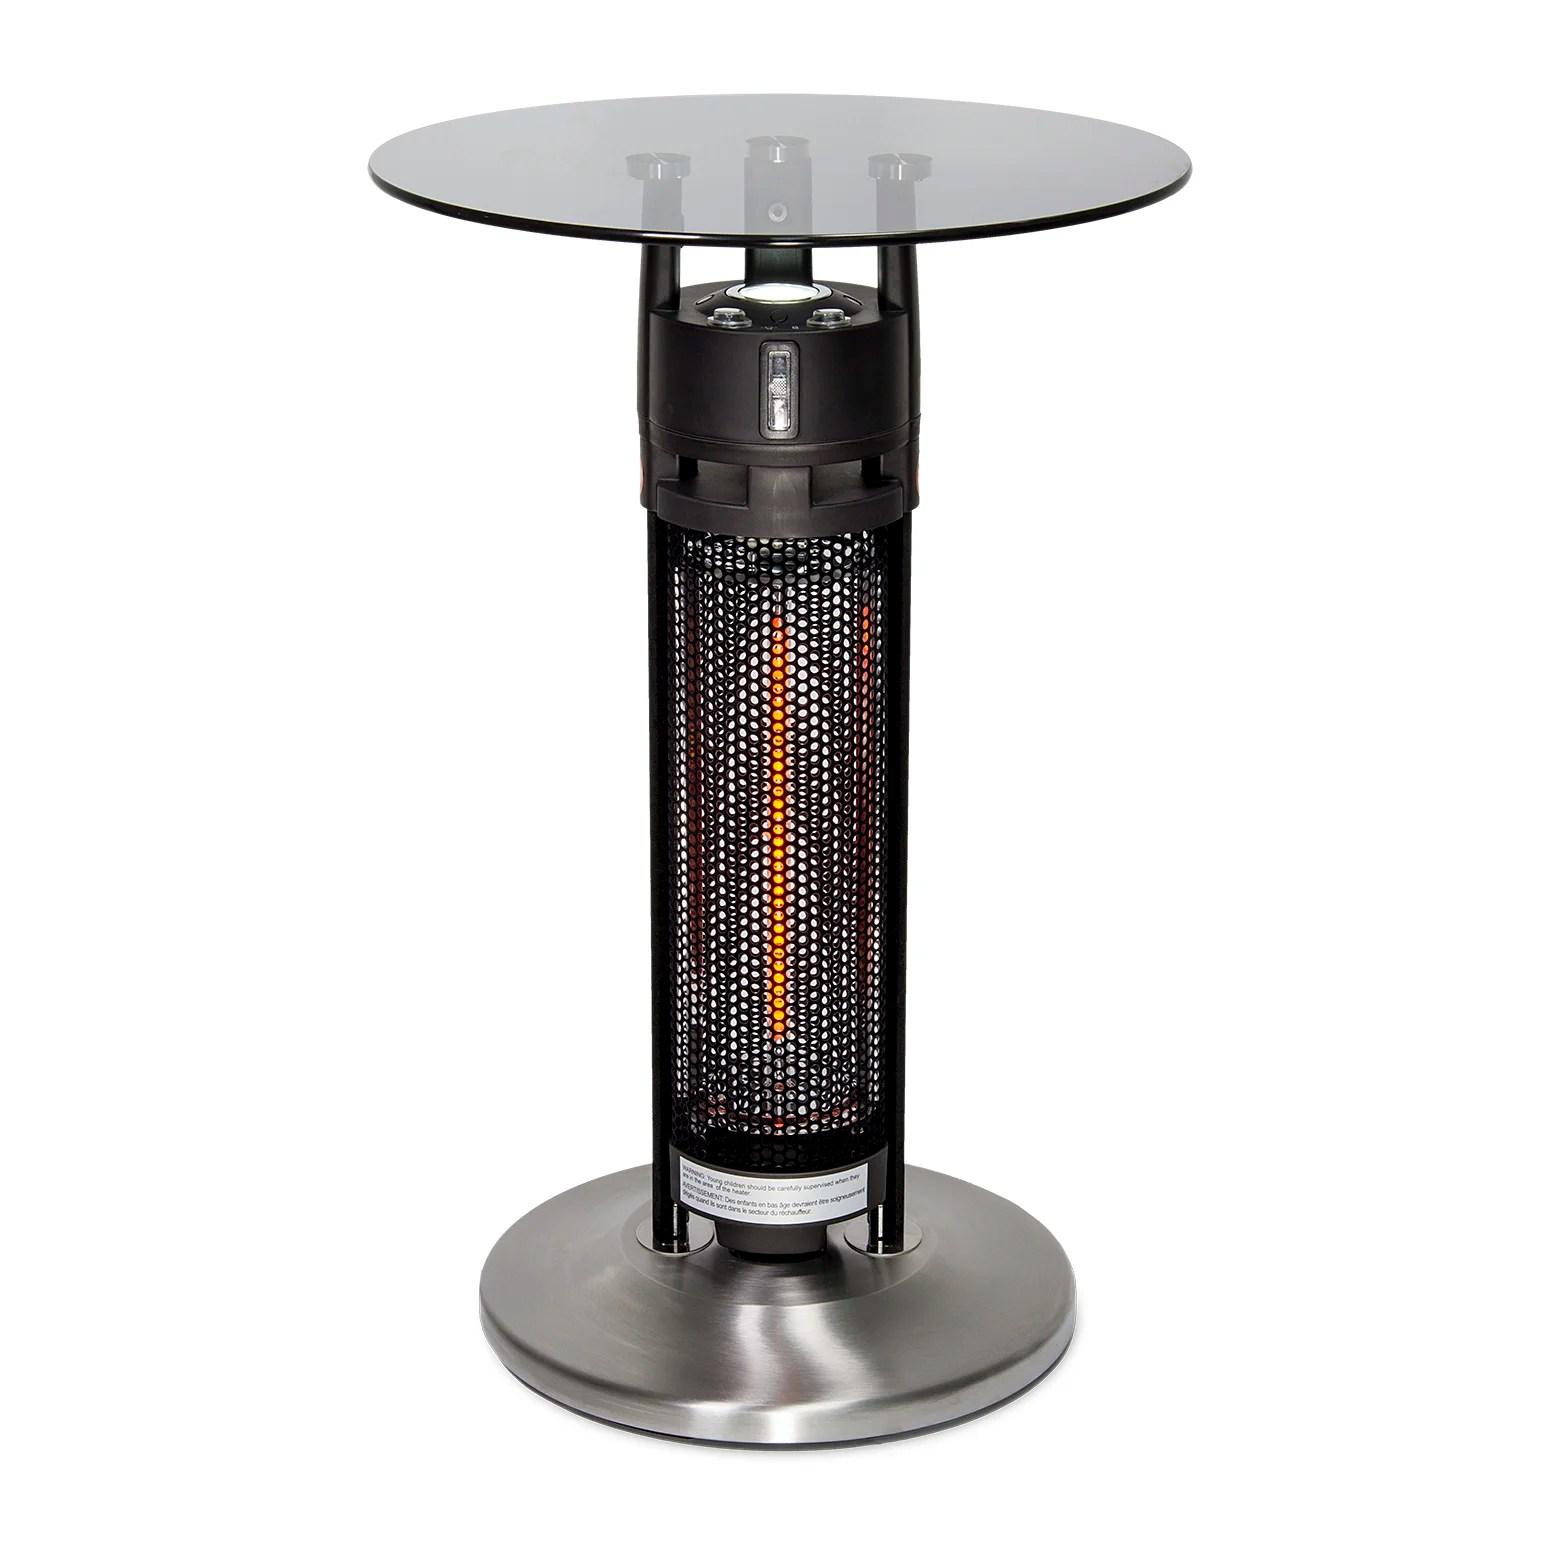 GreenTech Environmental PureHeat Table Electric Patio